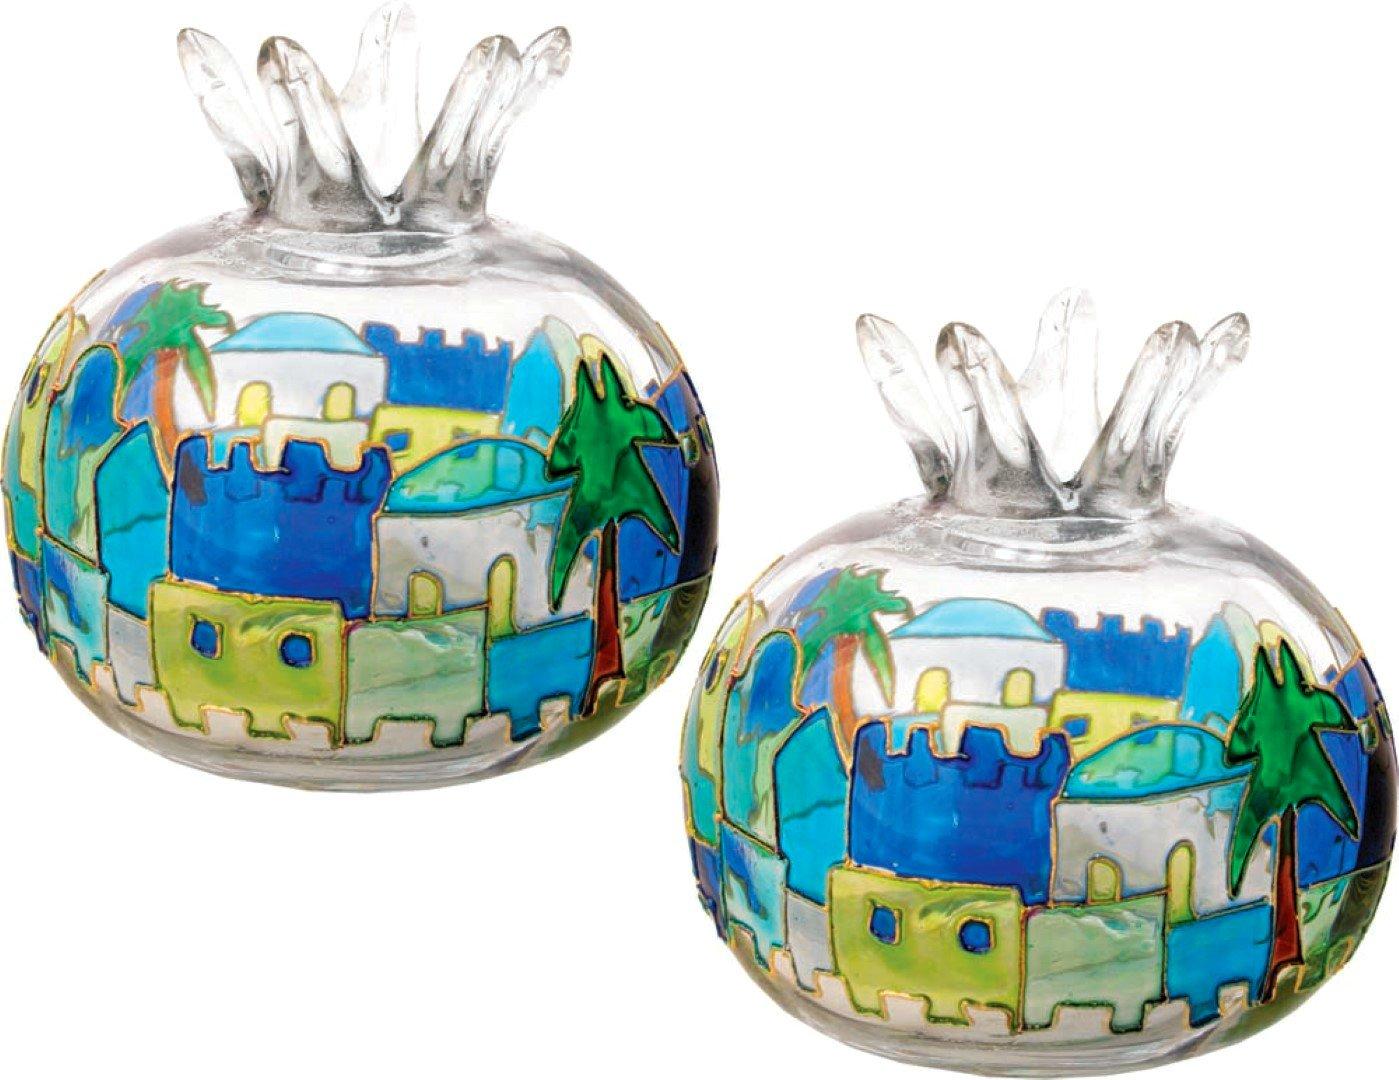 2 in lot Jerusalem Pomegranate Shabbat Candles Holder Hand Painted Glass Candlesticks Judaica Gift Green